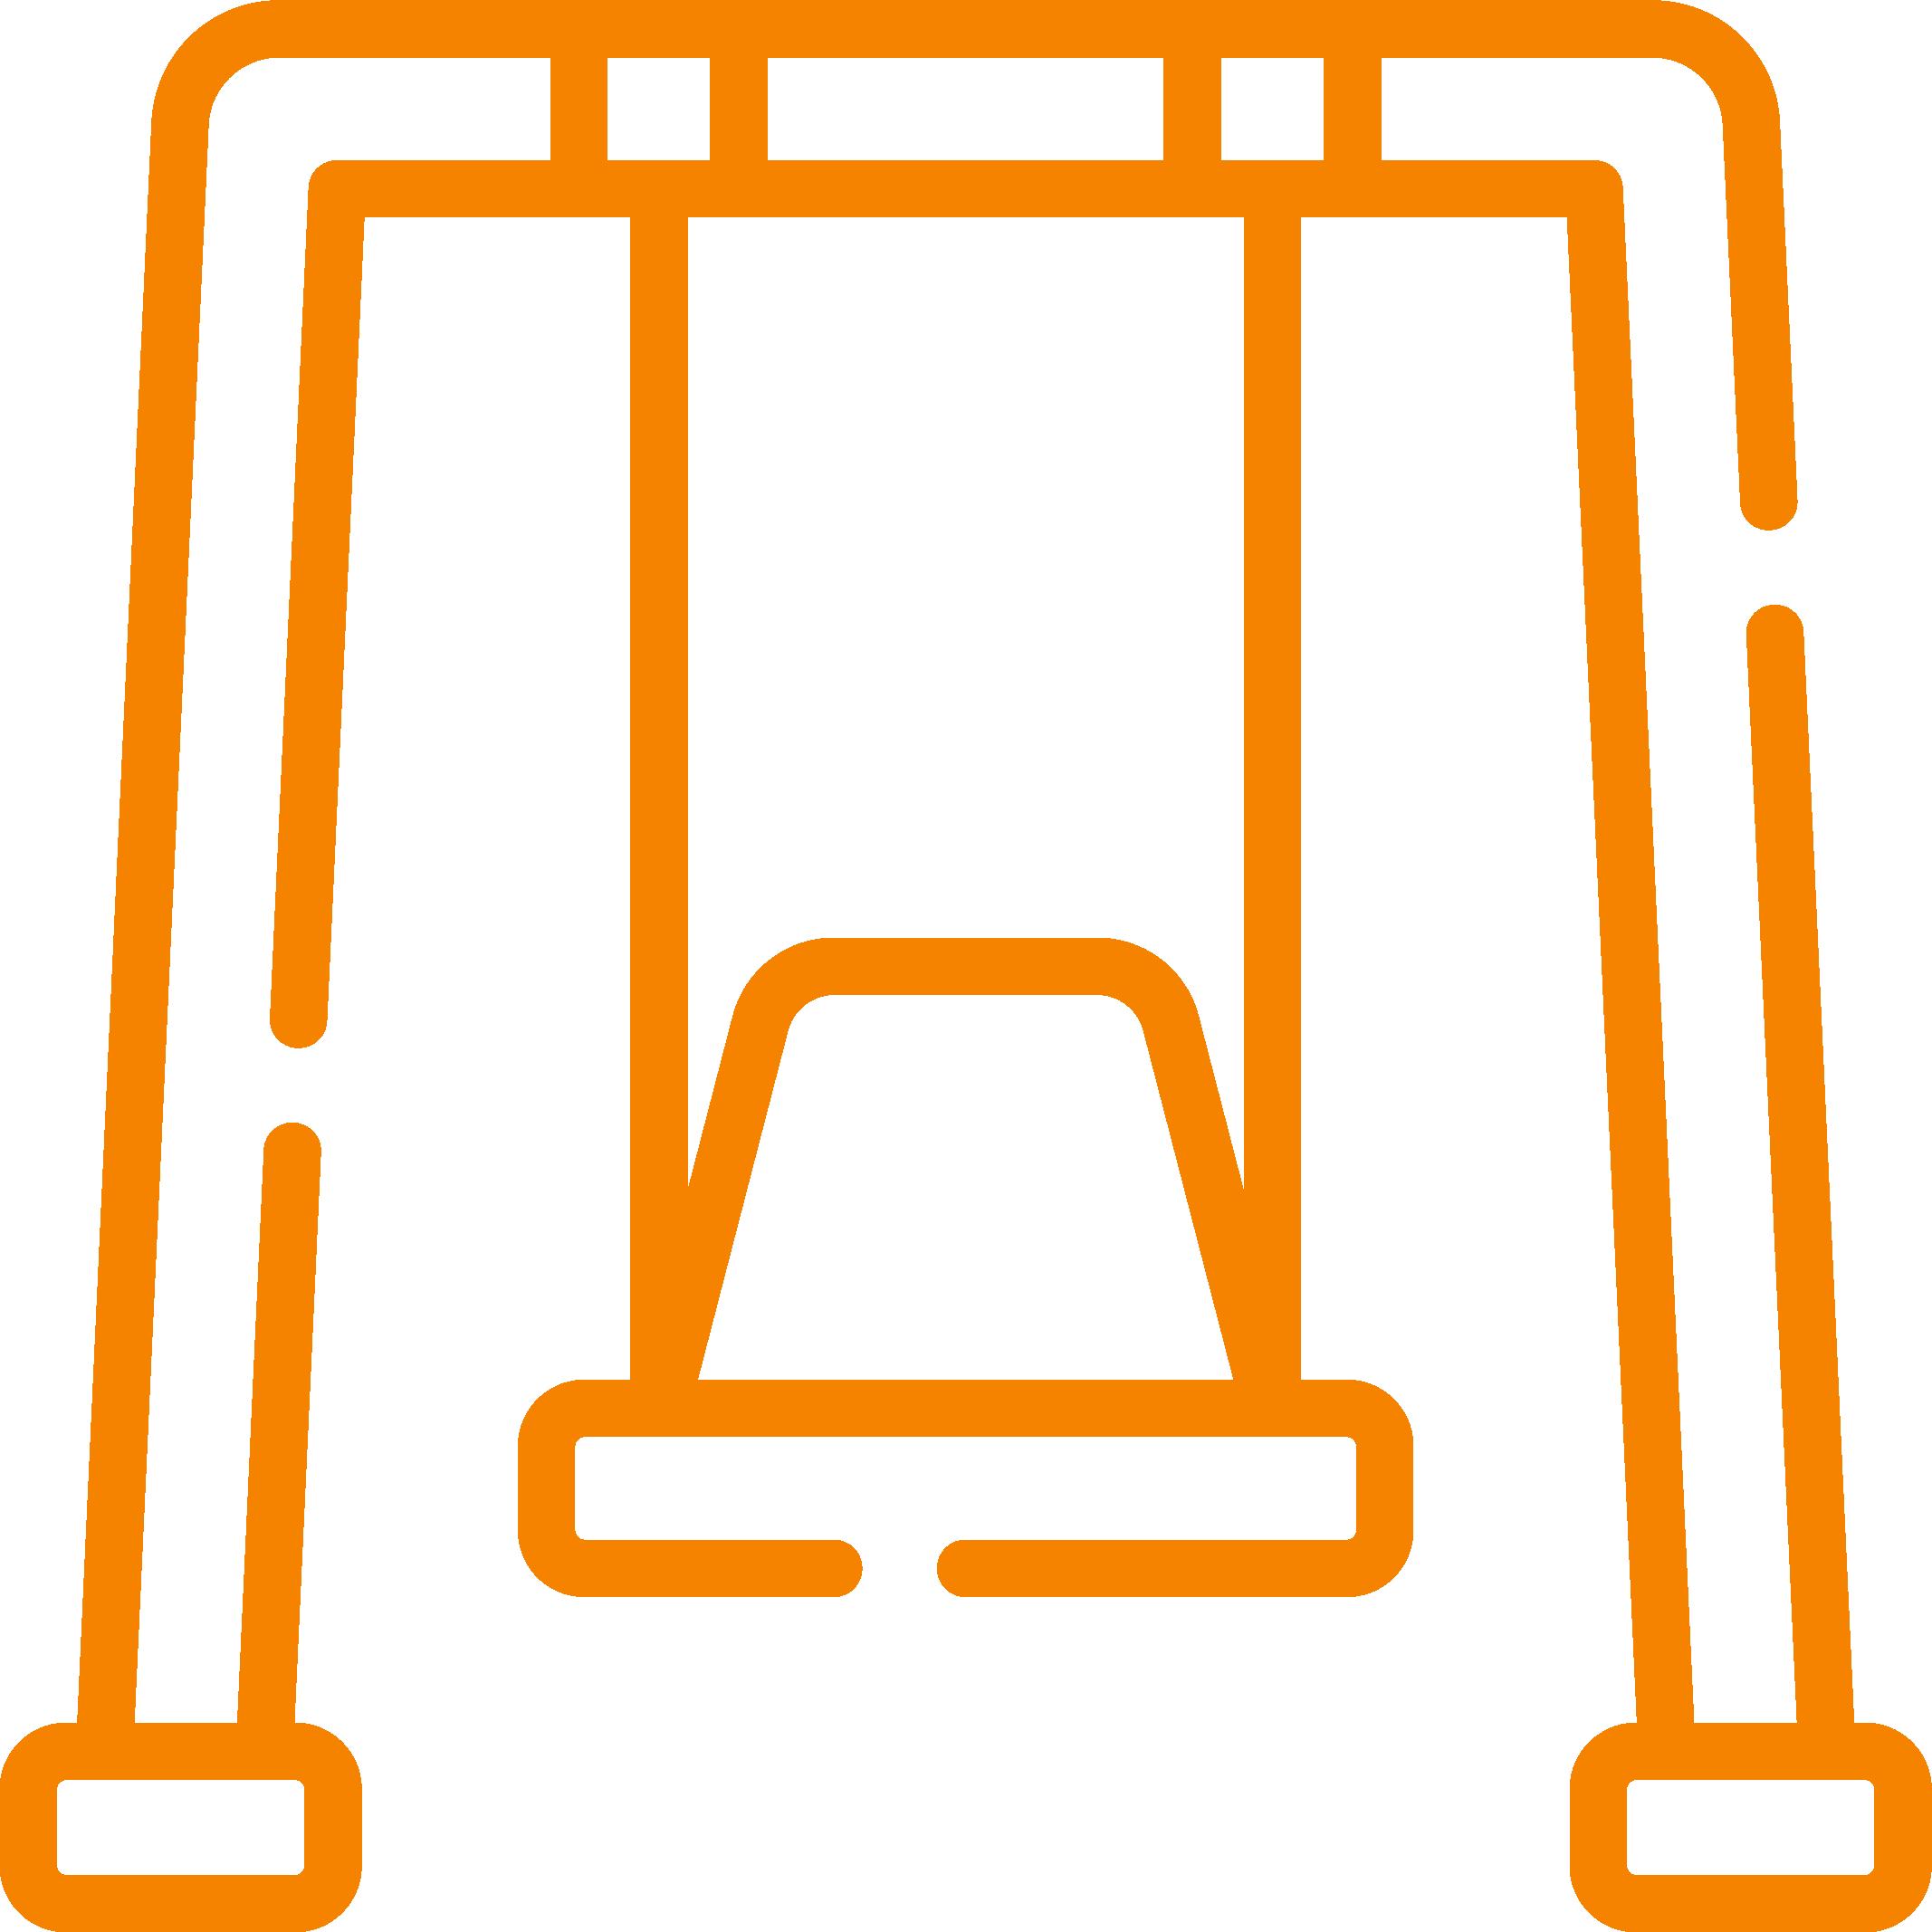 Wooden Swingset Icon